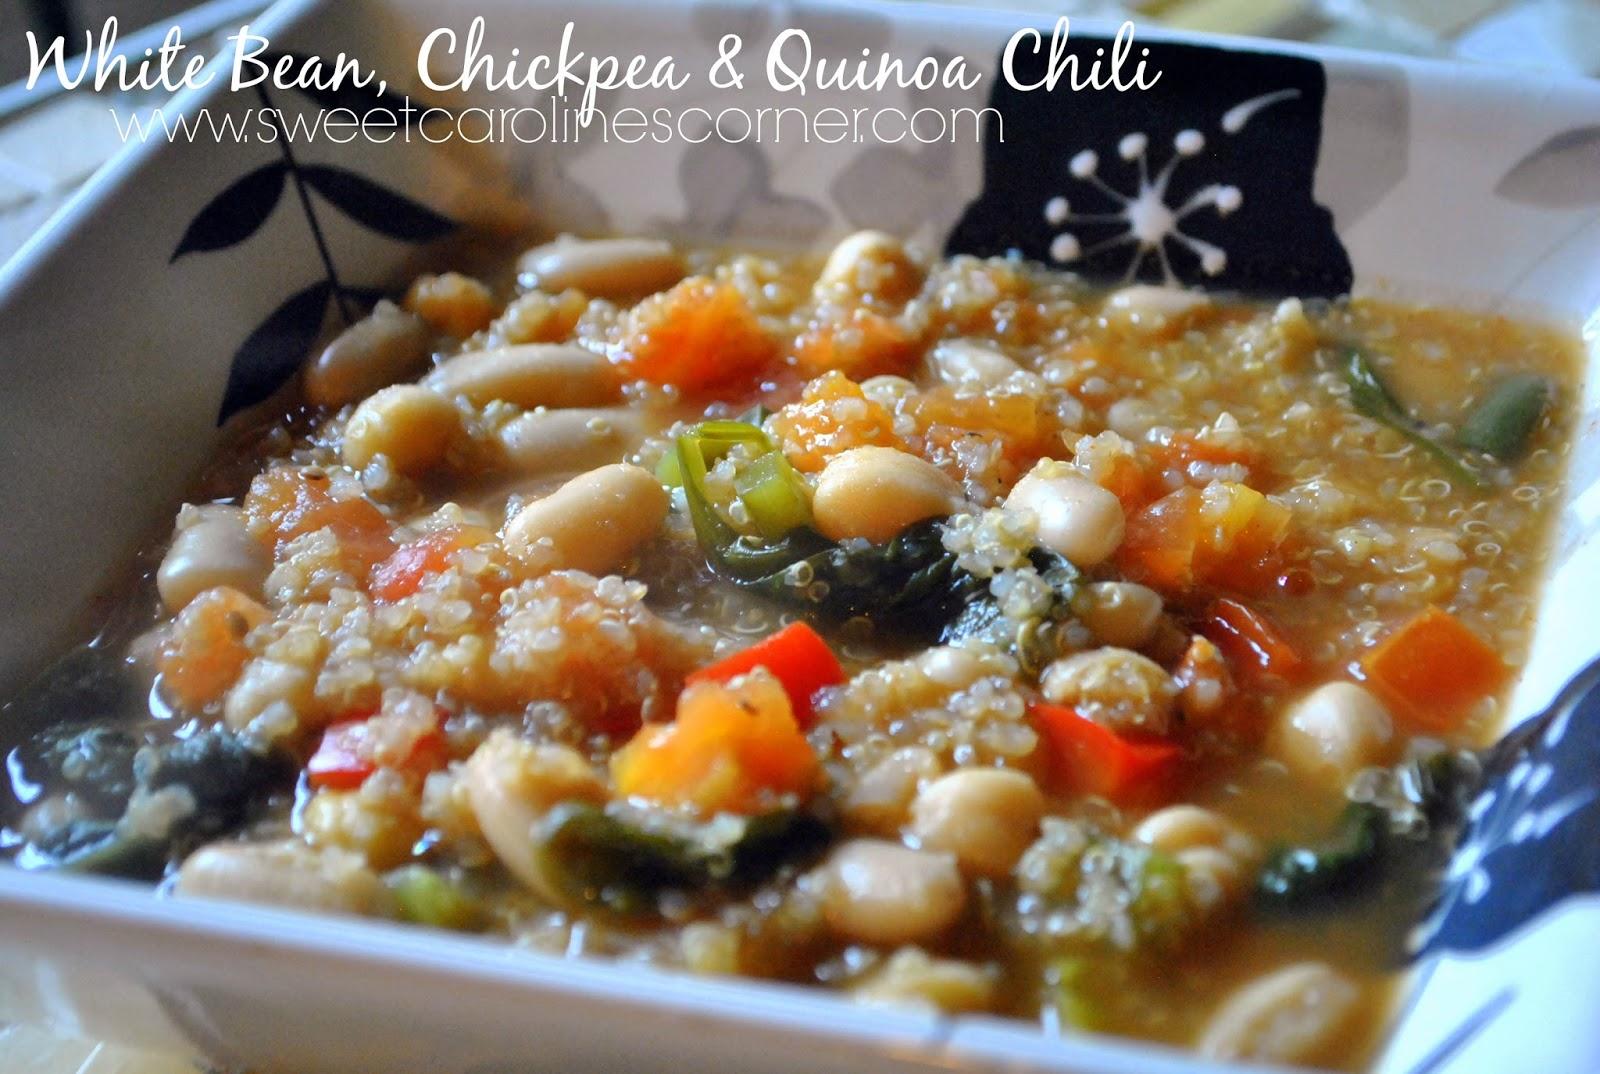 white bean, chickpea & quinoa chili (chili de feijão branco, grão de bico e quinoa)